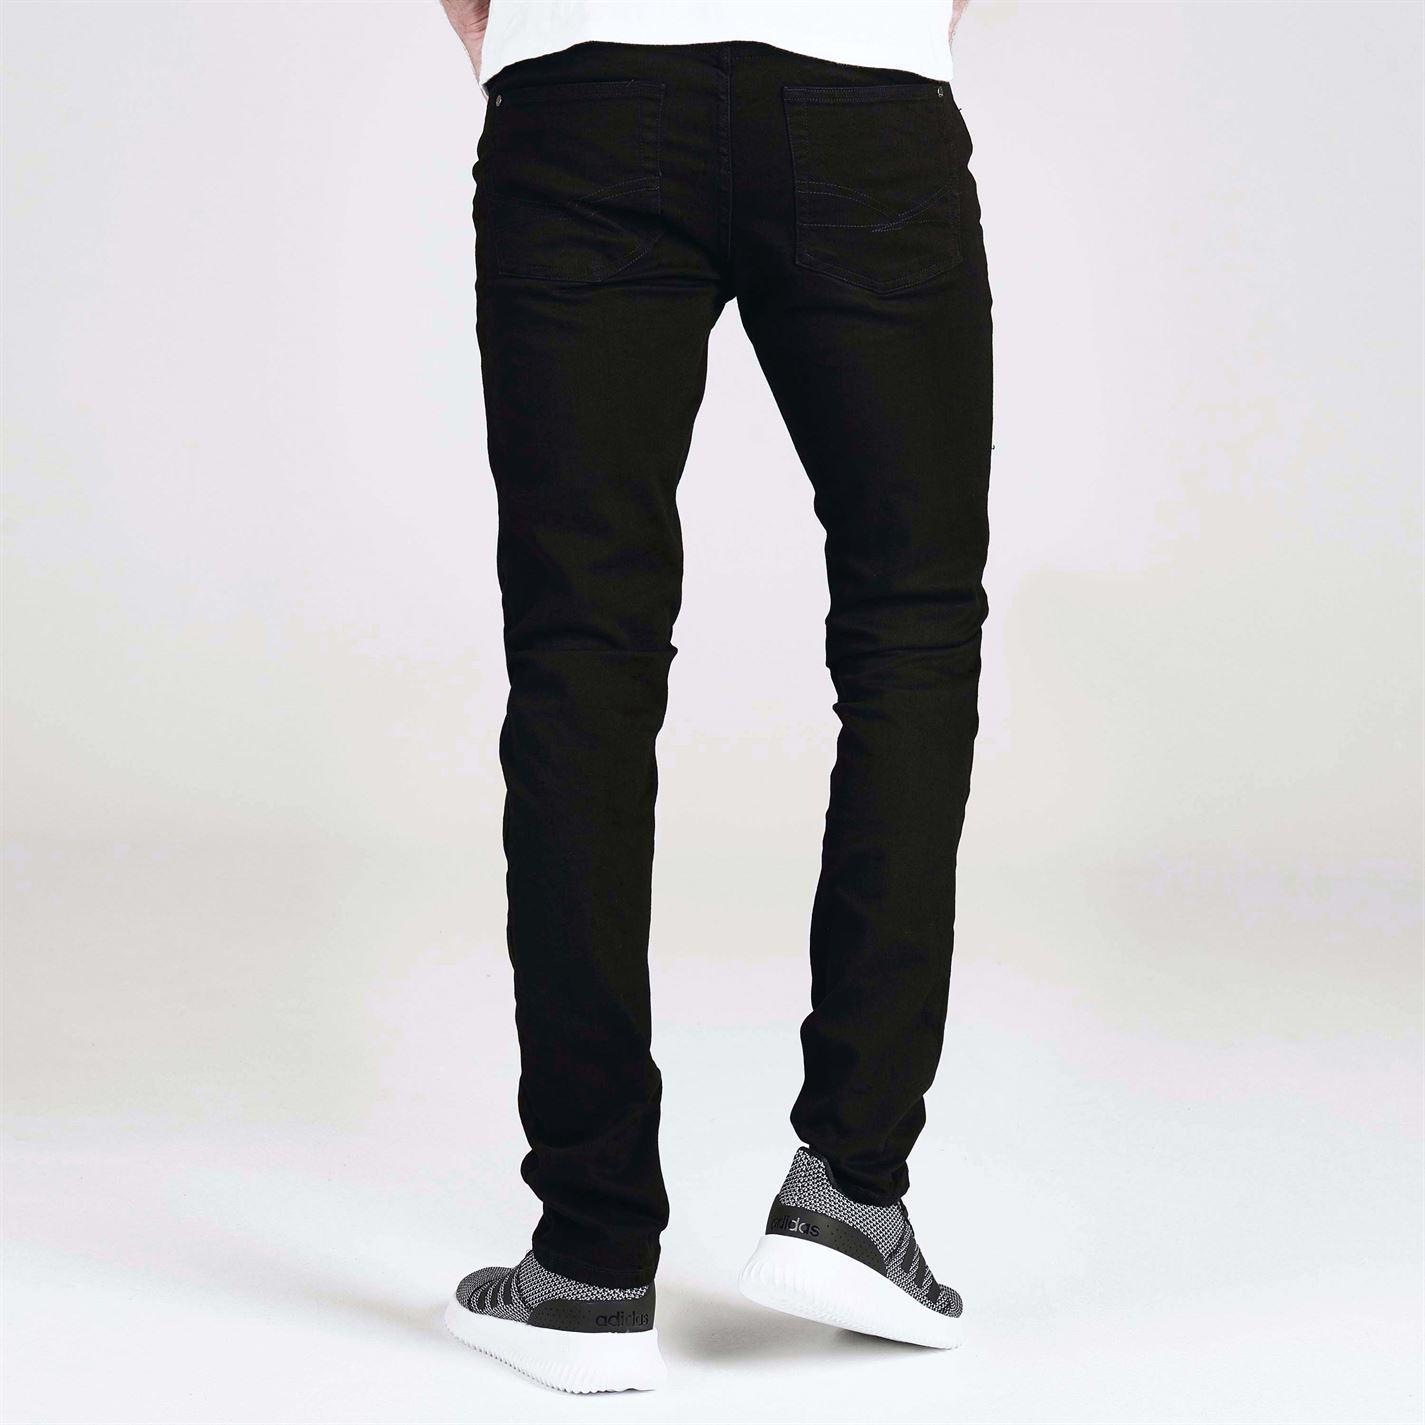 Jeans-Denim-Firetrap-Skinny-Mens-Trouser-Black thumbnail 15